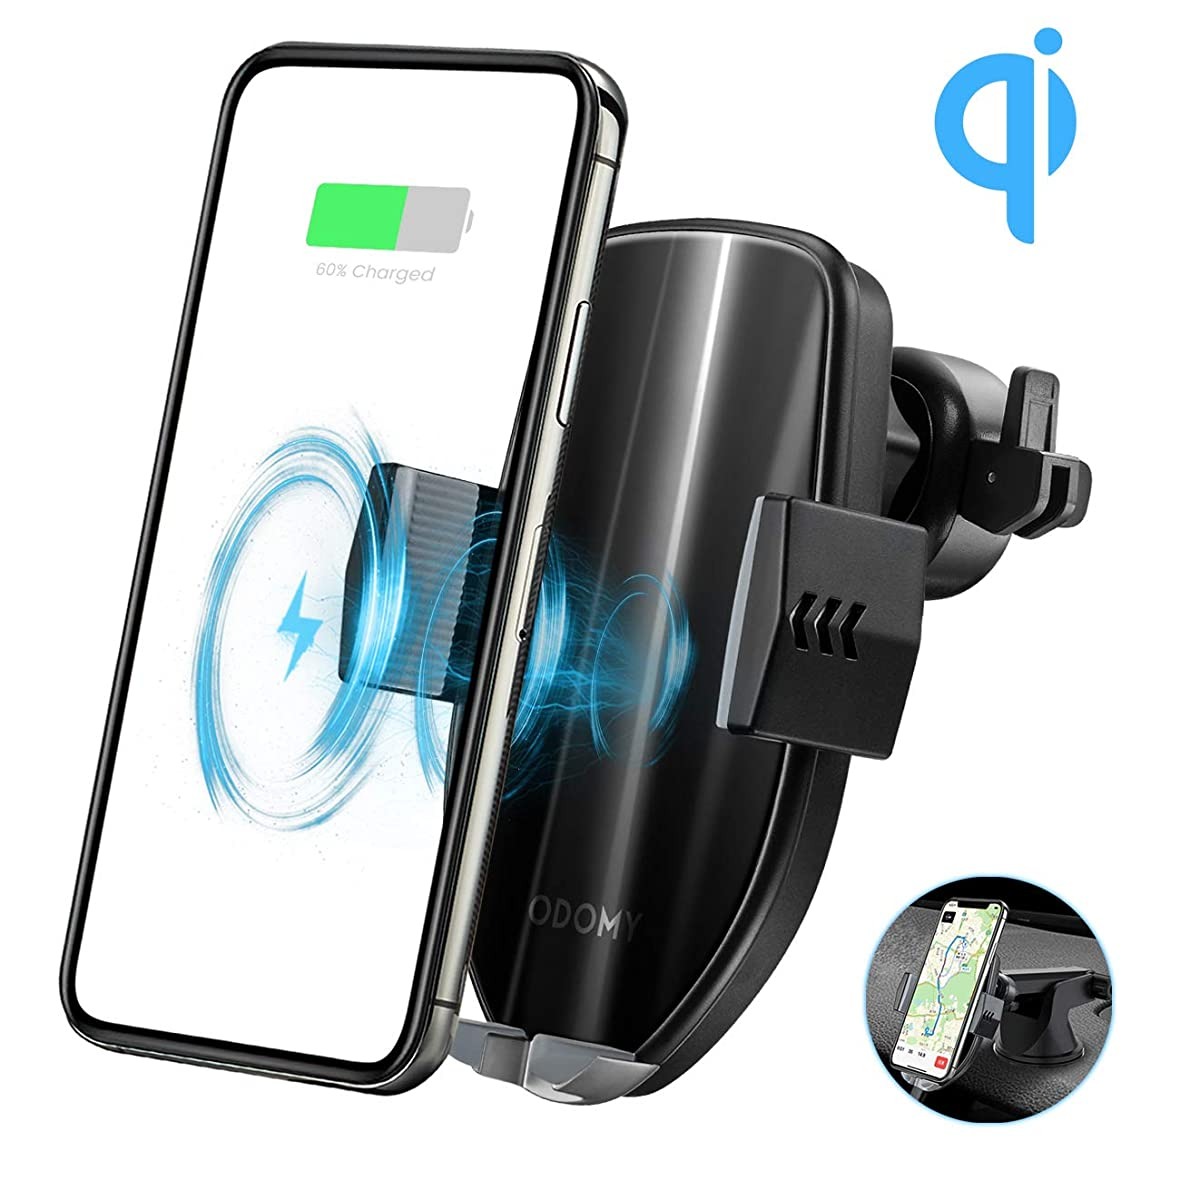 ODOMY 車載ワイヤレス充電器 車載QI 車載ホルダー ワイヤレス充電器 QC3.0 10W 急速充電 自動開閉 停電利用 360度回転 吸盤式 エアコン口 iPhone X/XR/XS/XSMAX/8/8Plus/GalaxyS10/S10+/S9/S9+/S8/S8Plus/ Note8/Note5/Nexus4/5/6/pixel3/3xl/XperiaZ3v/XZ2/XZ2 Premium/XZ3 4.7-6.4インチスマホなどのワイヤレス充電機種に対応(ブラック)